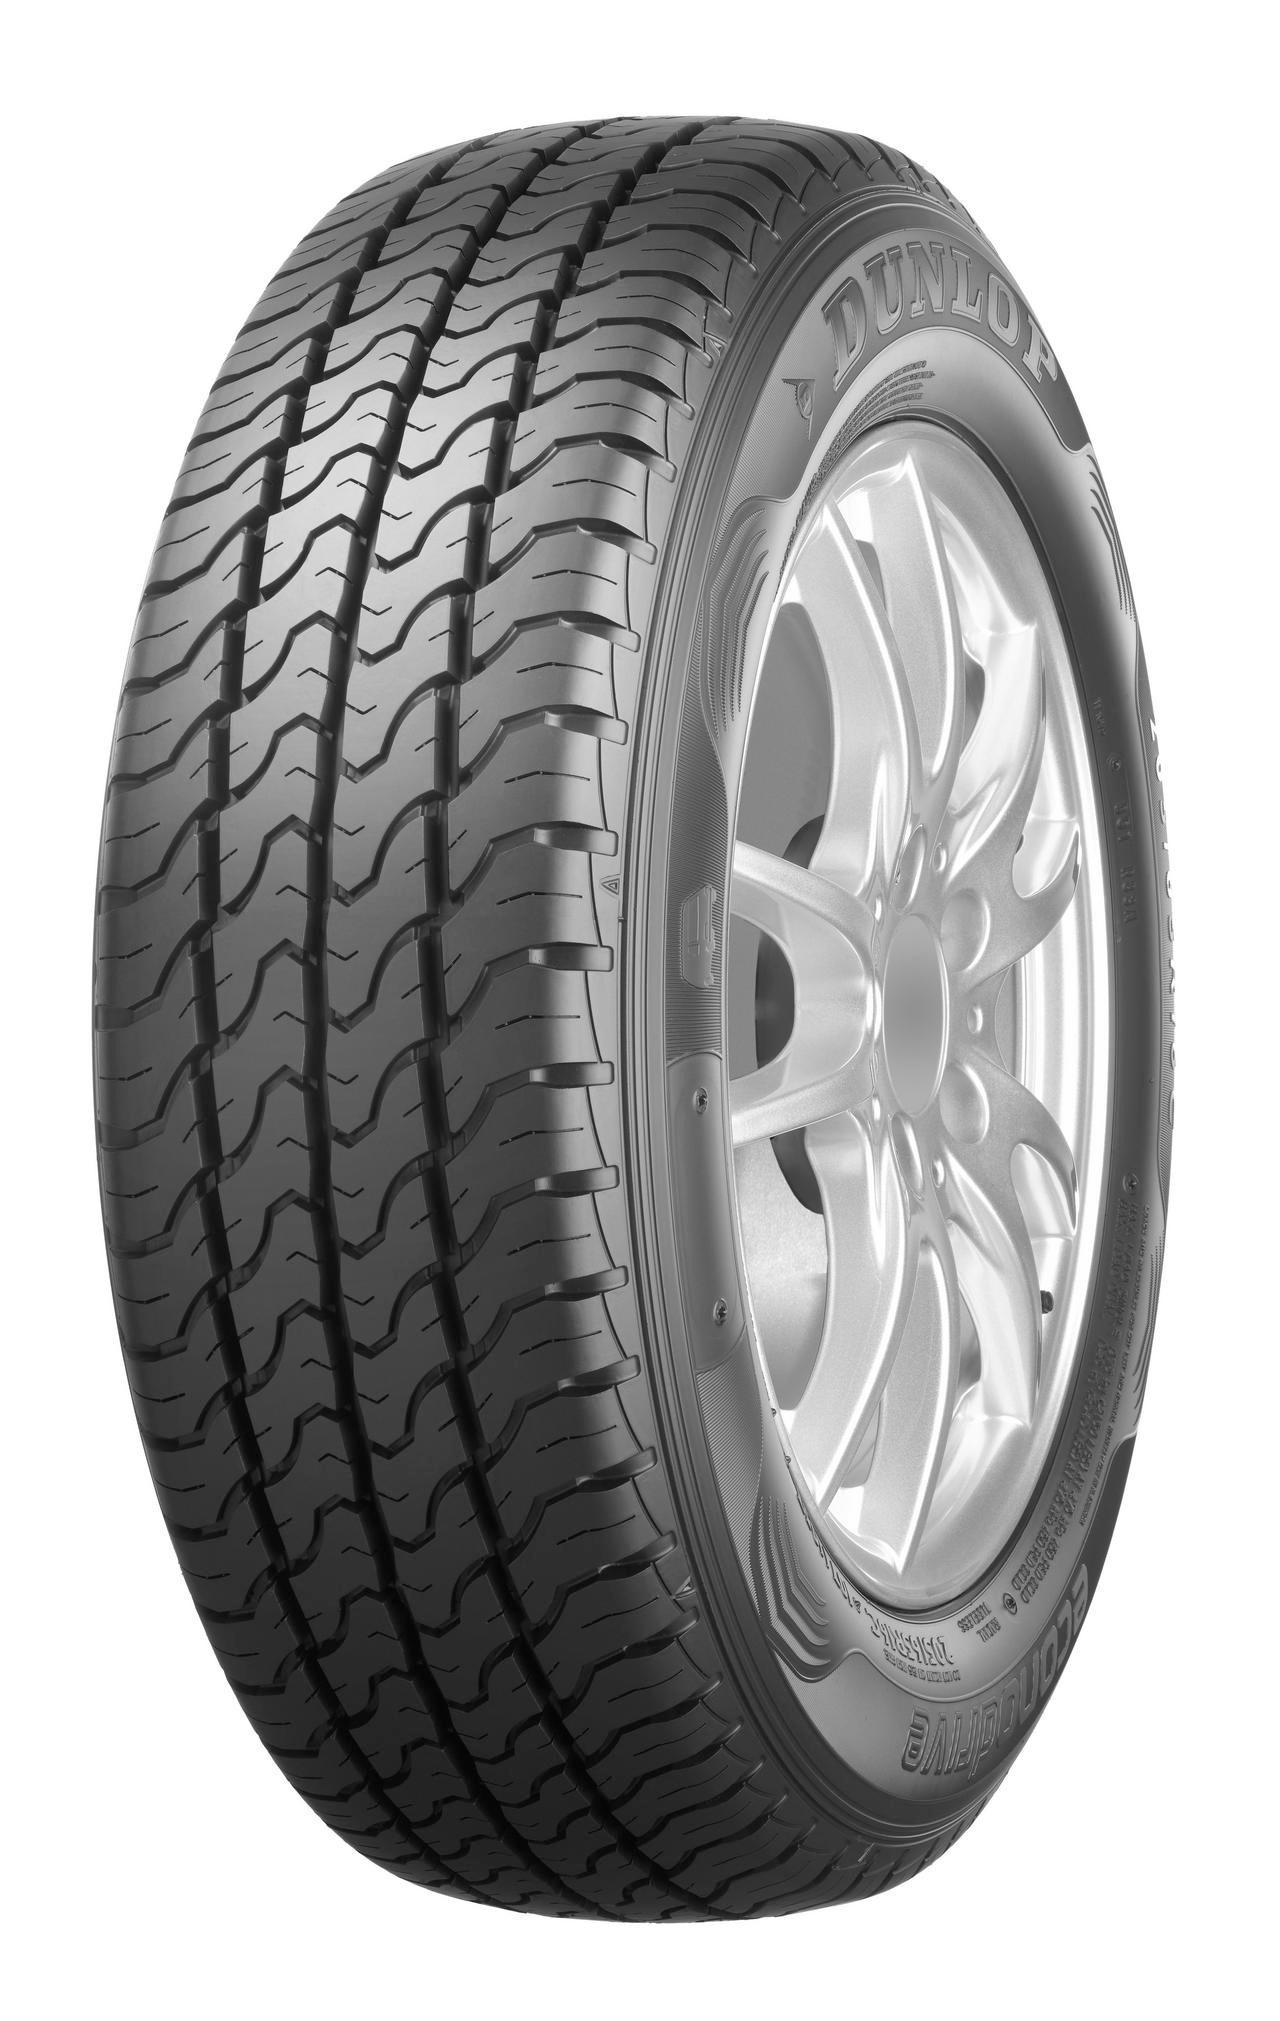 Dunlop Econodrive 225/65R16C 112/110R